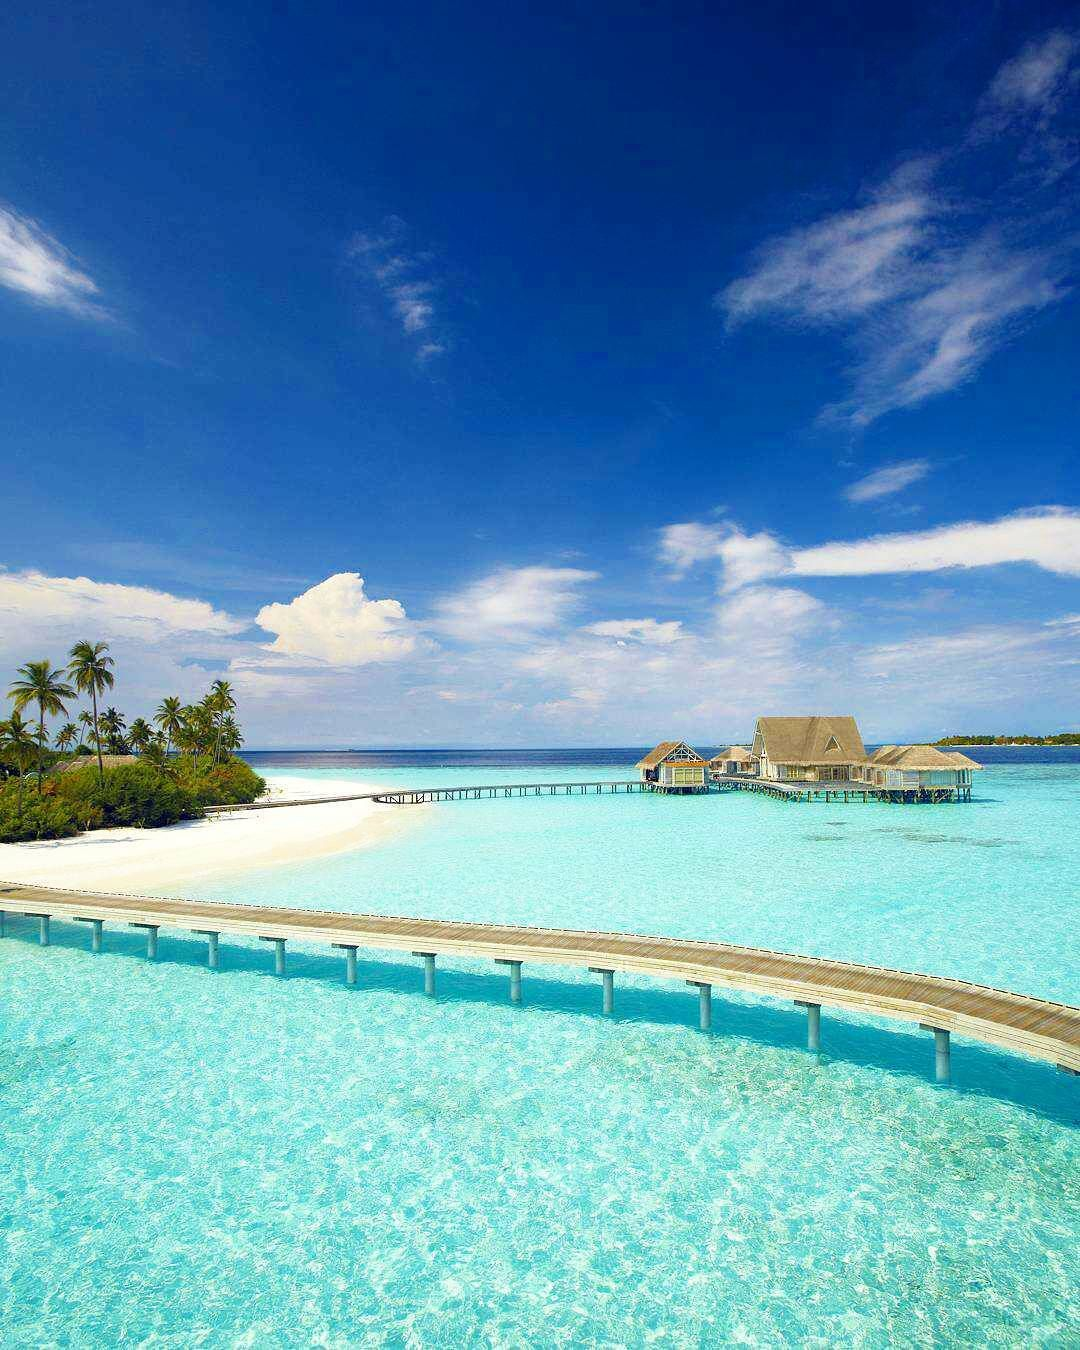 Beach Island: The Maldives Islands - Anantara